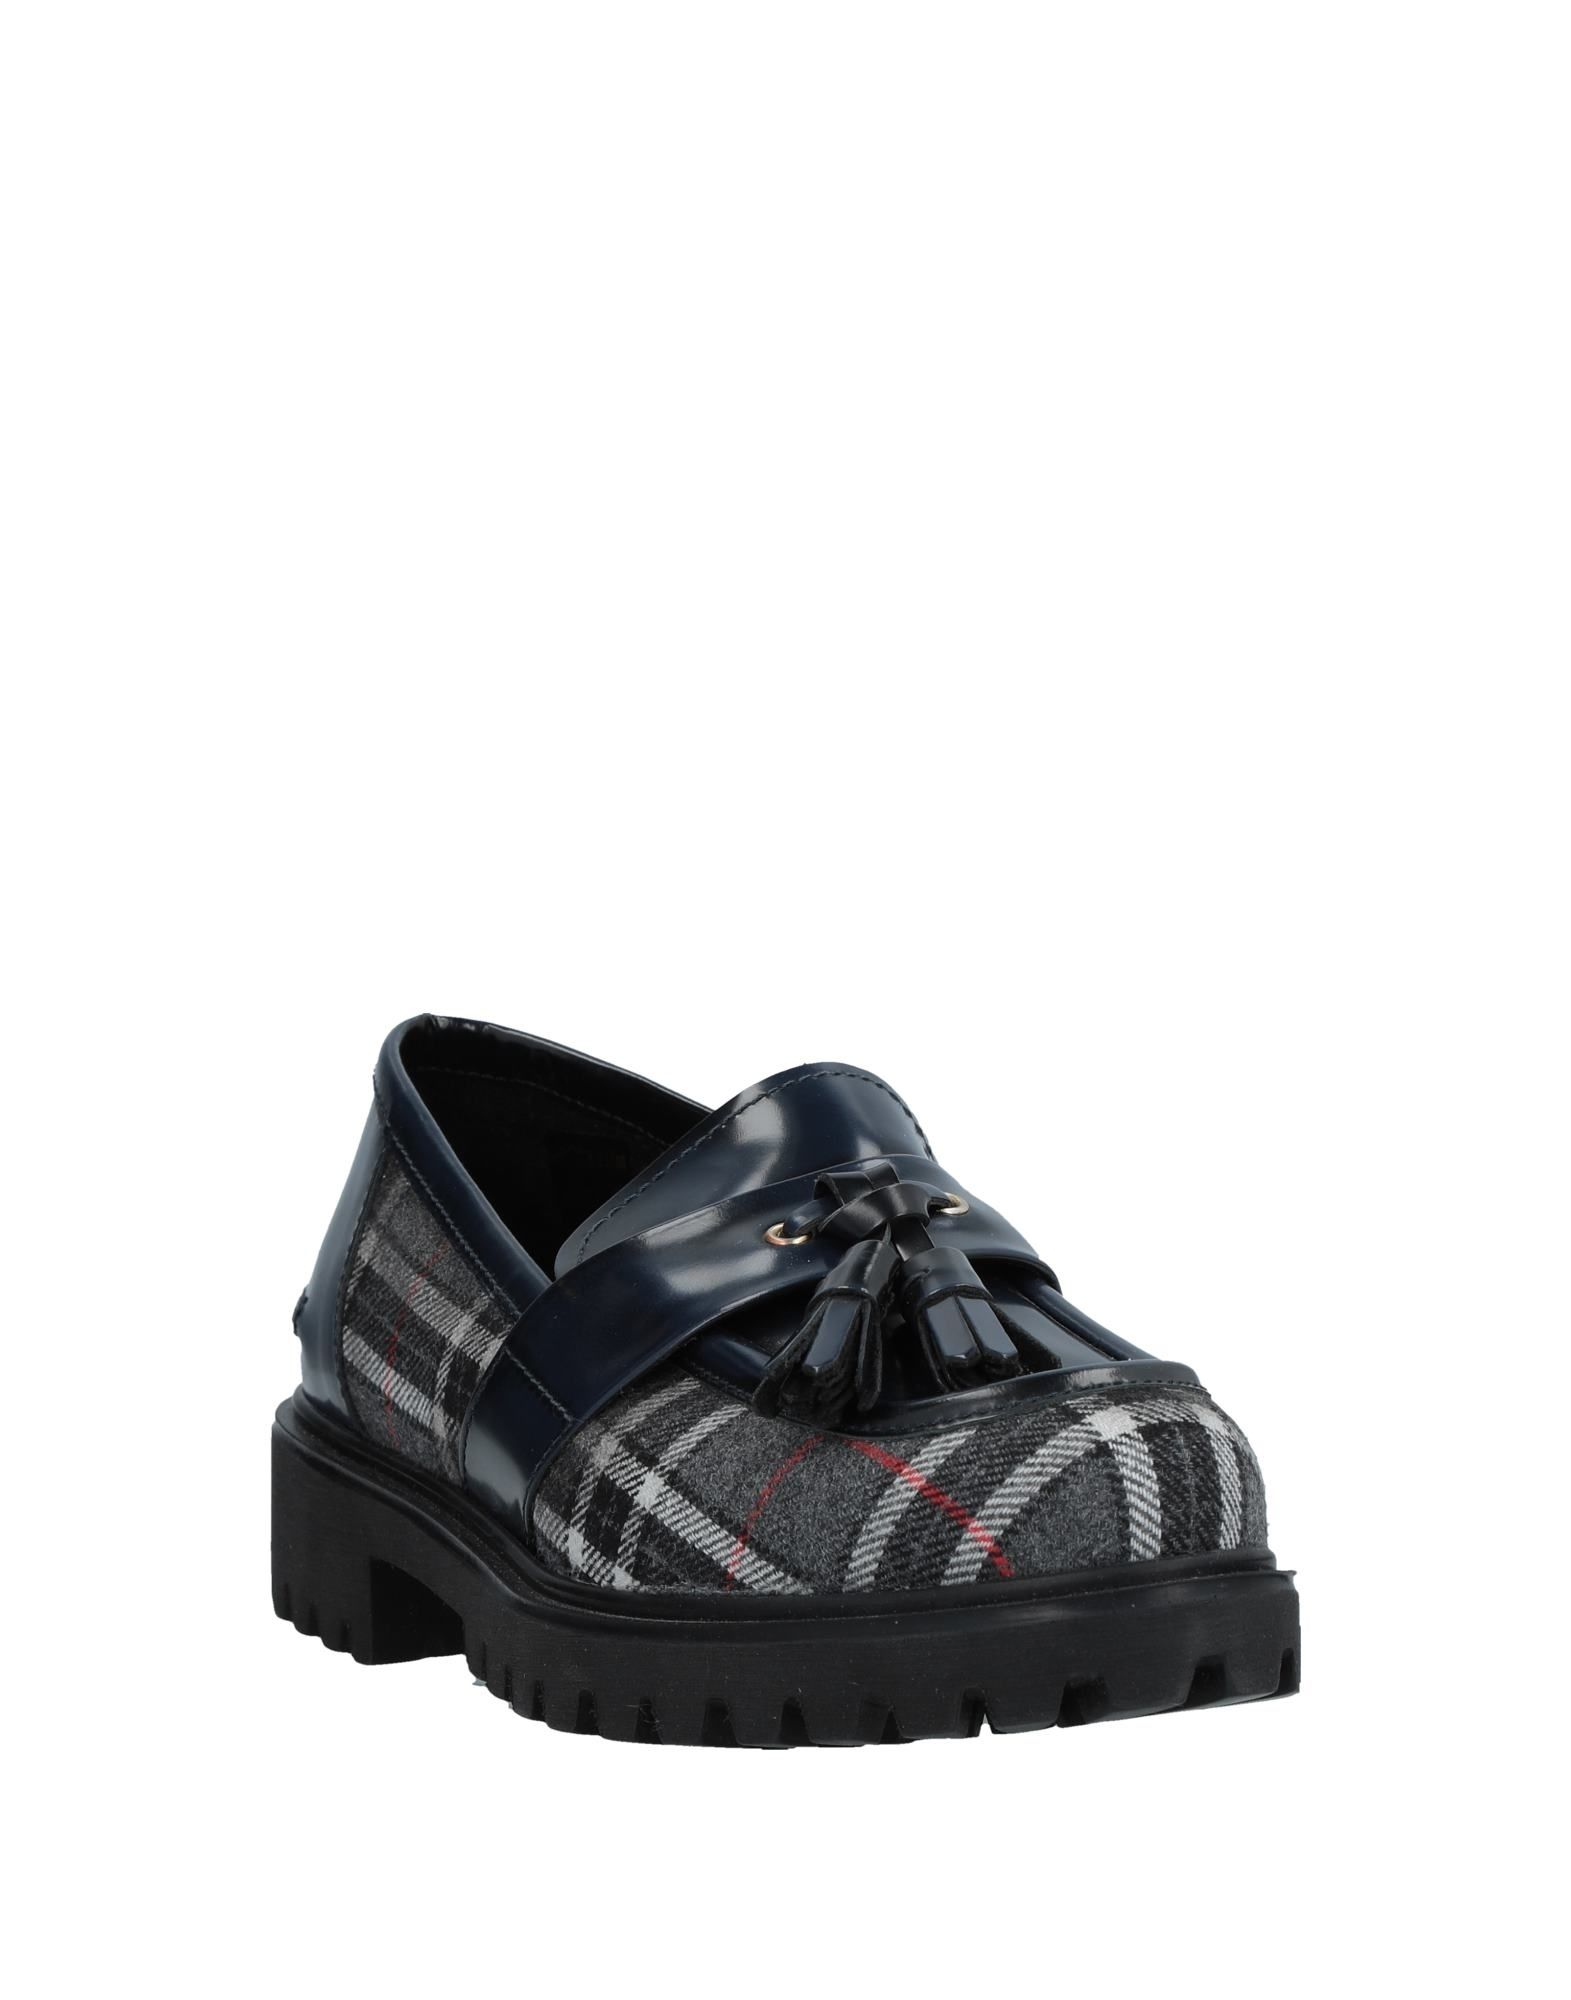 Stilvolle billige Mokassins Schuhe Blue Les Copains Mokassins billige Damen  11526063OP 84057c